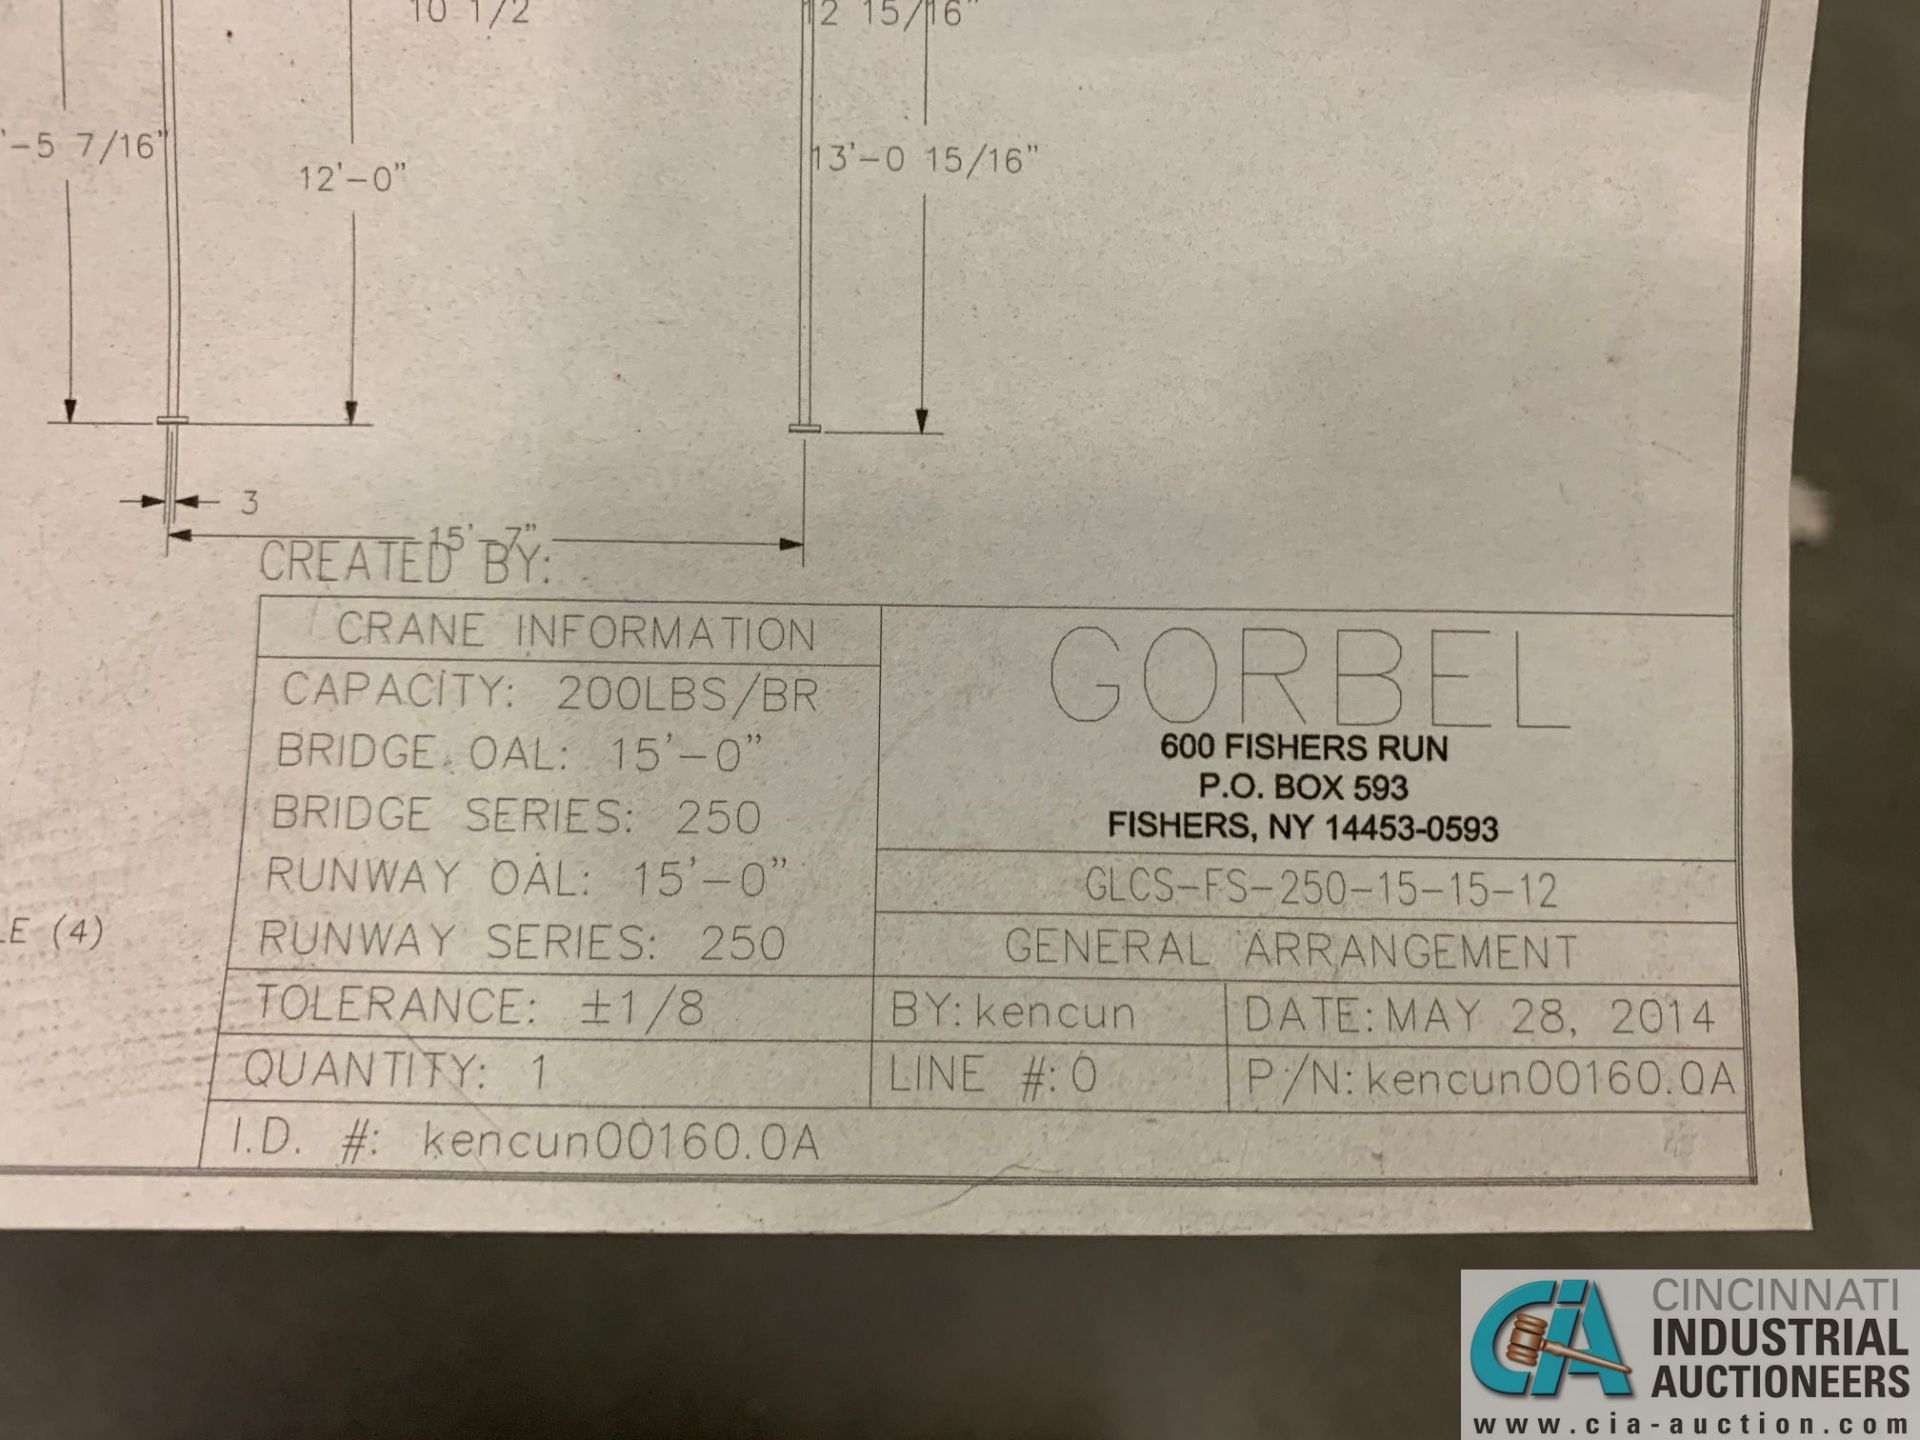 200 LB. GORBEL MODEL GLCS-FS-250-15-15-12 FREE-STANDING CRANE SYSTEM; 15' BRIDGE OAL, 15' RUNWAY - Image 9 of 15